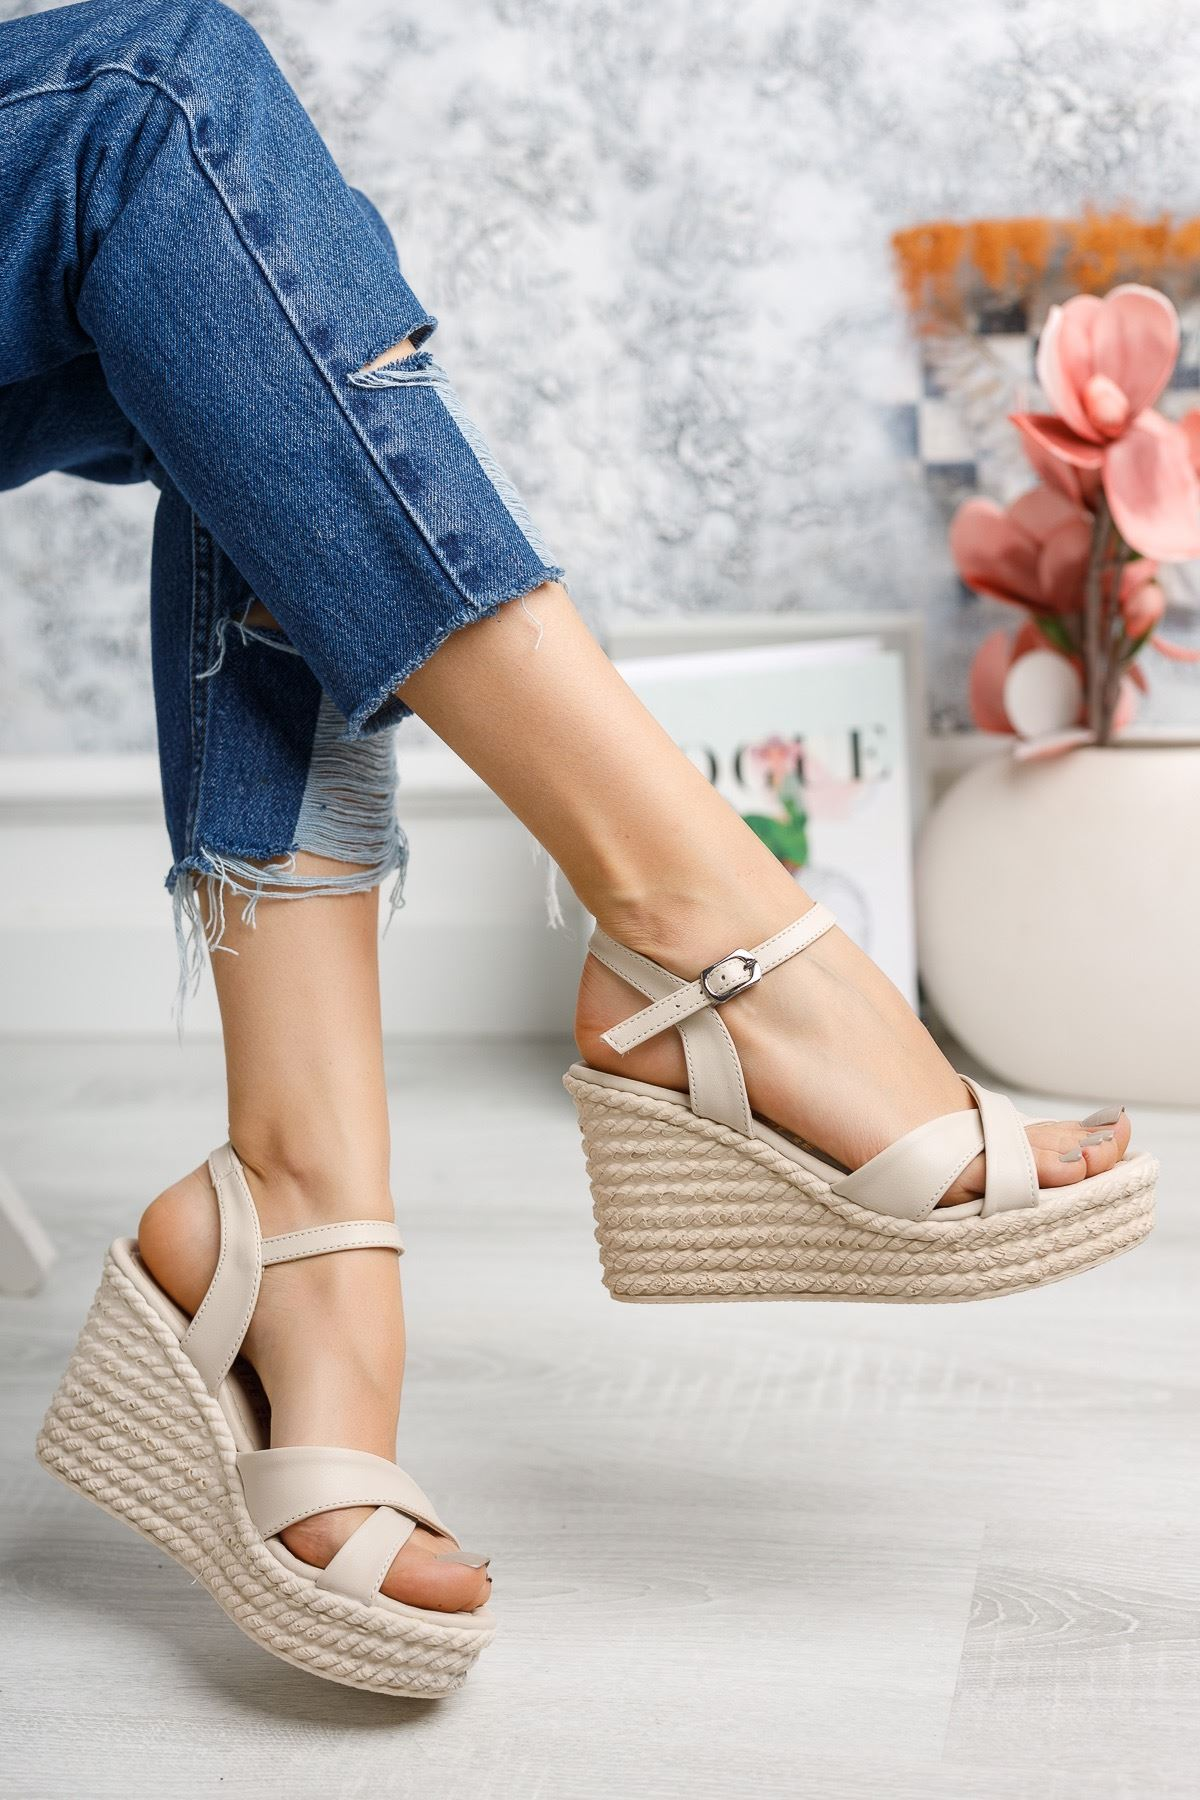 Mantar Taban Çapraz Bant Vizon Sandalet